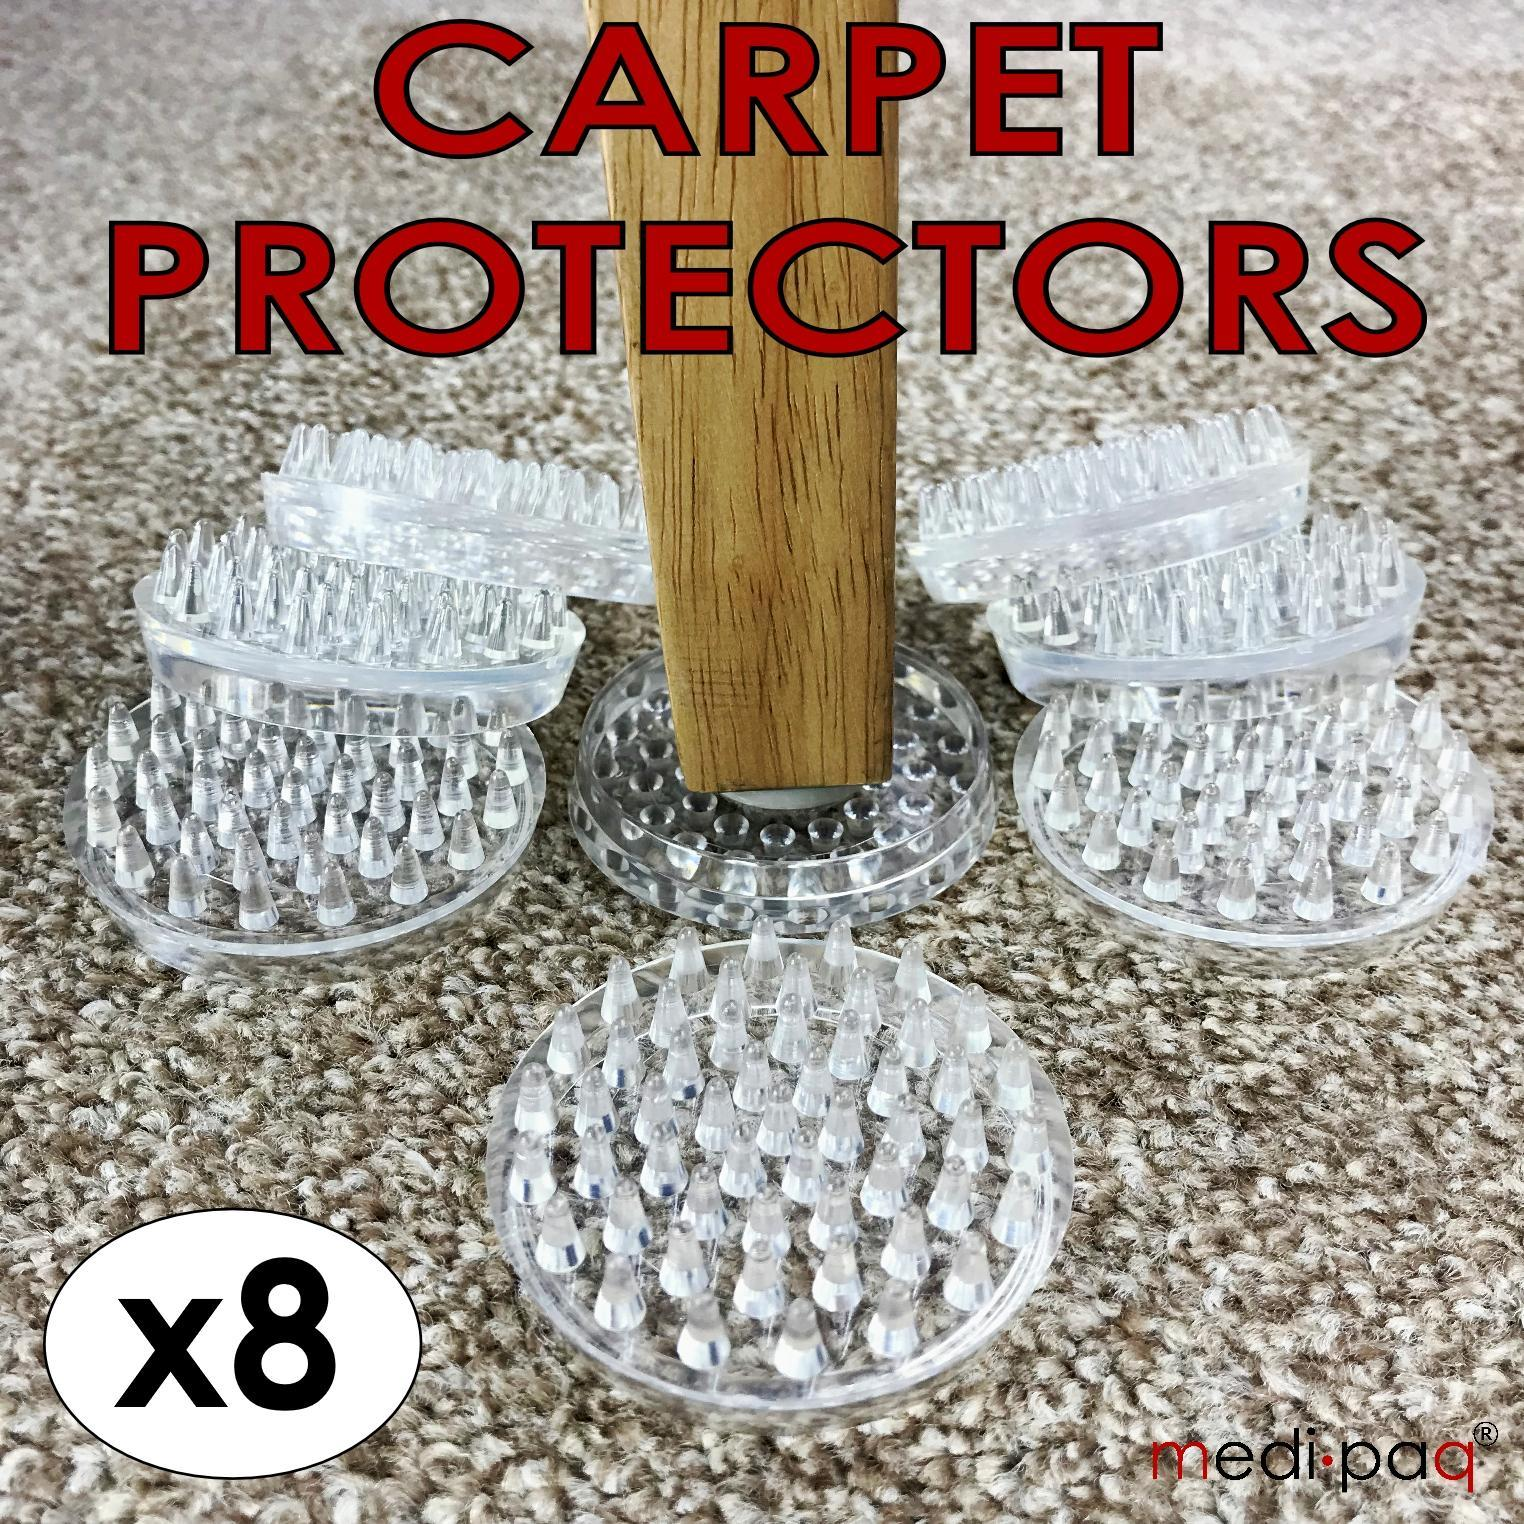 8x Carpet Protectors Cups Rug Mat Sofa Settee Chair Furniture Table